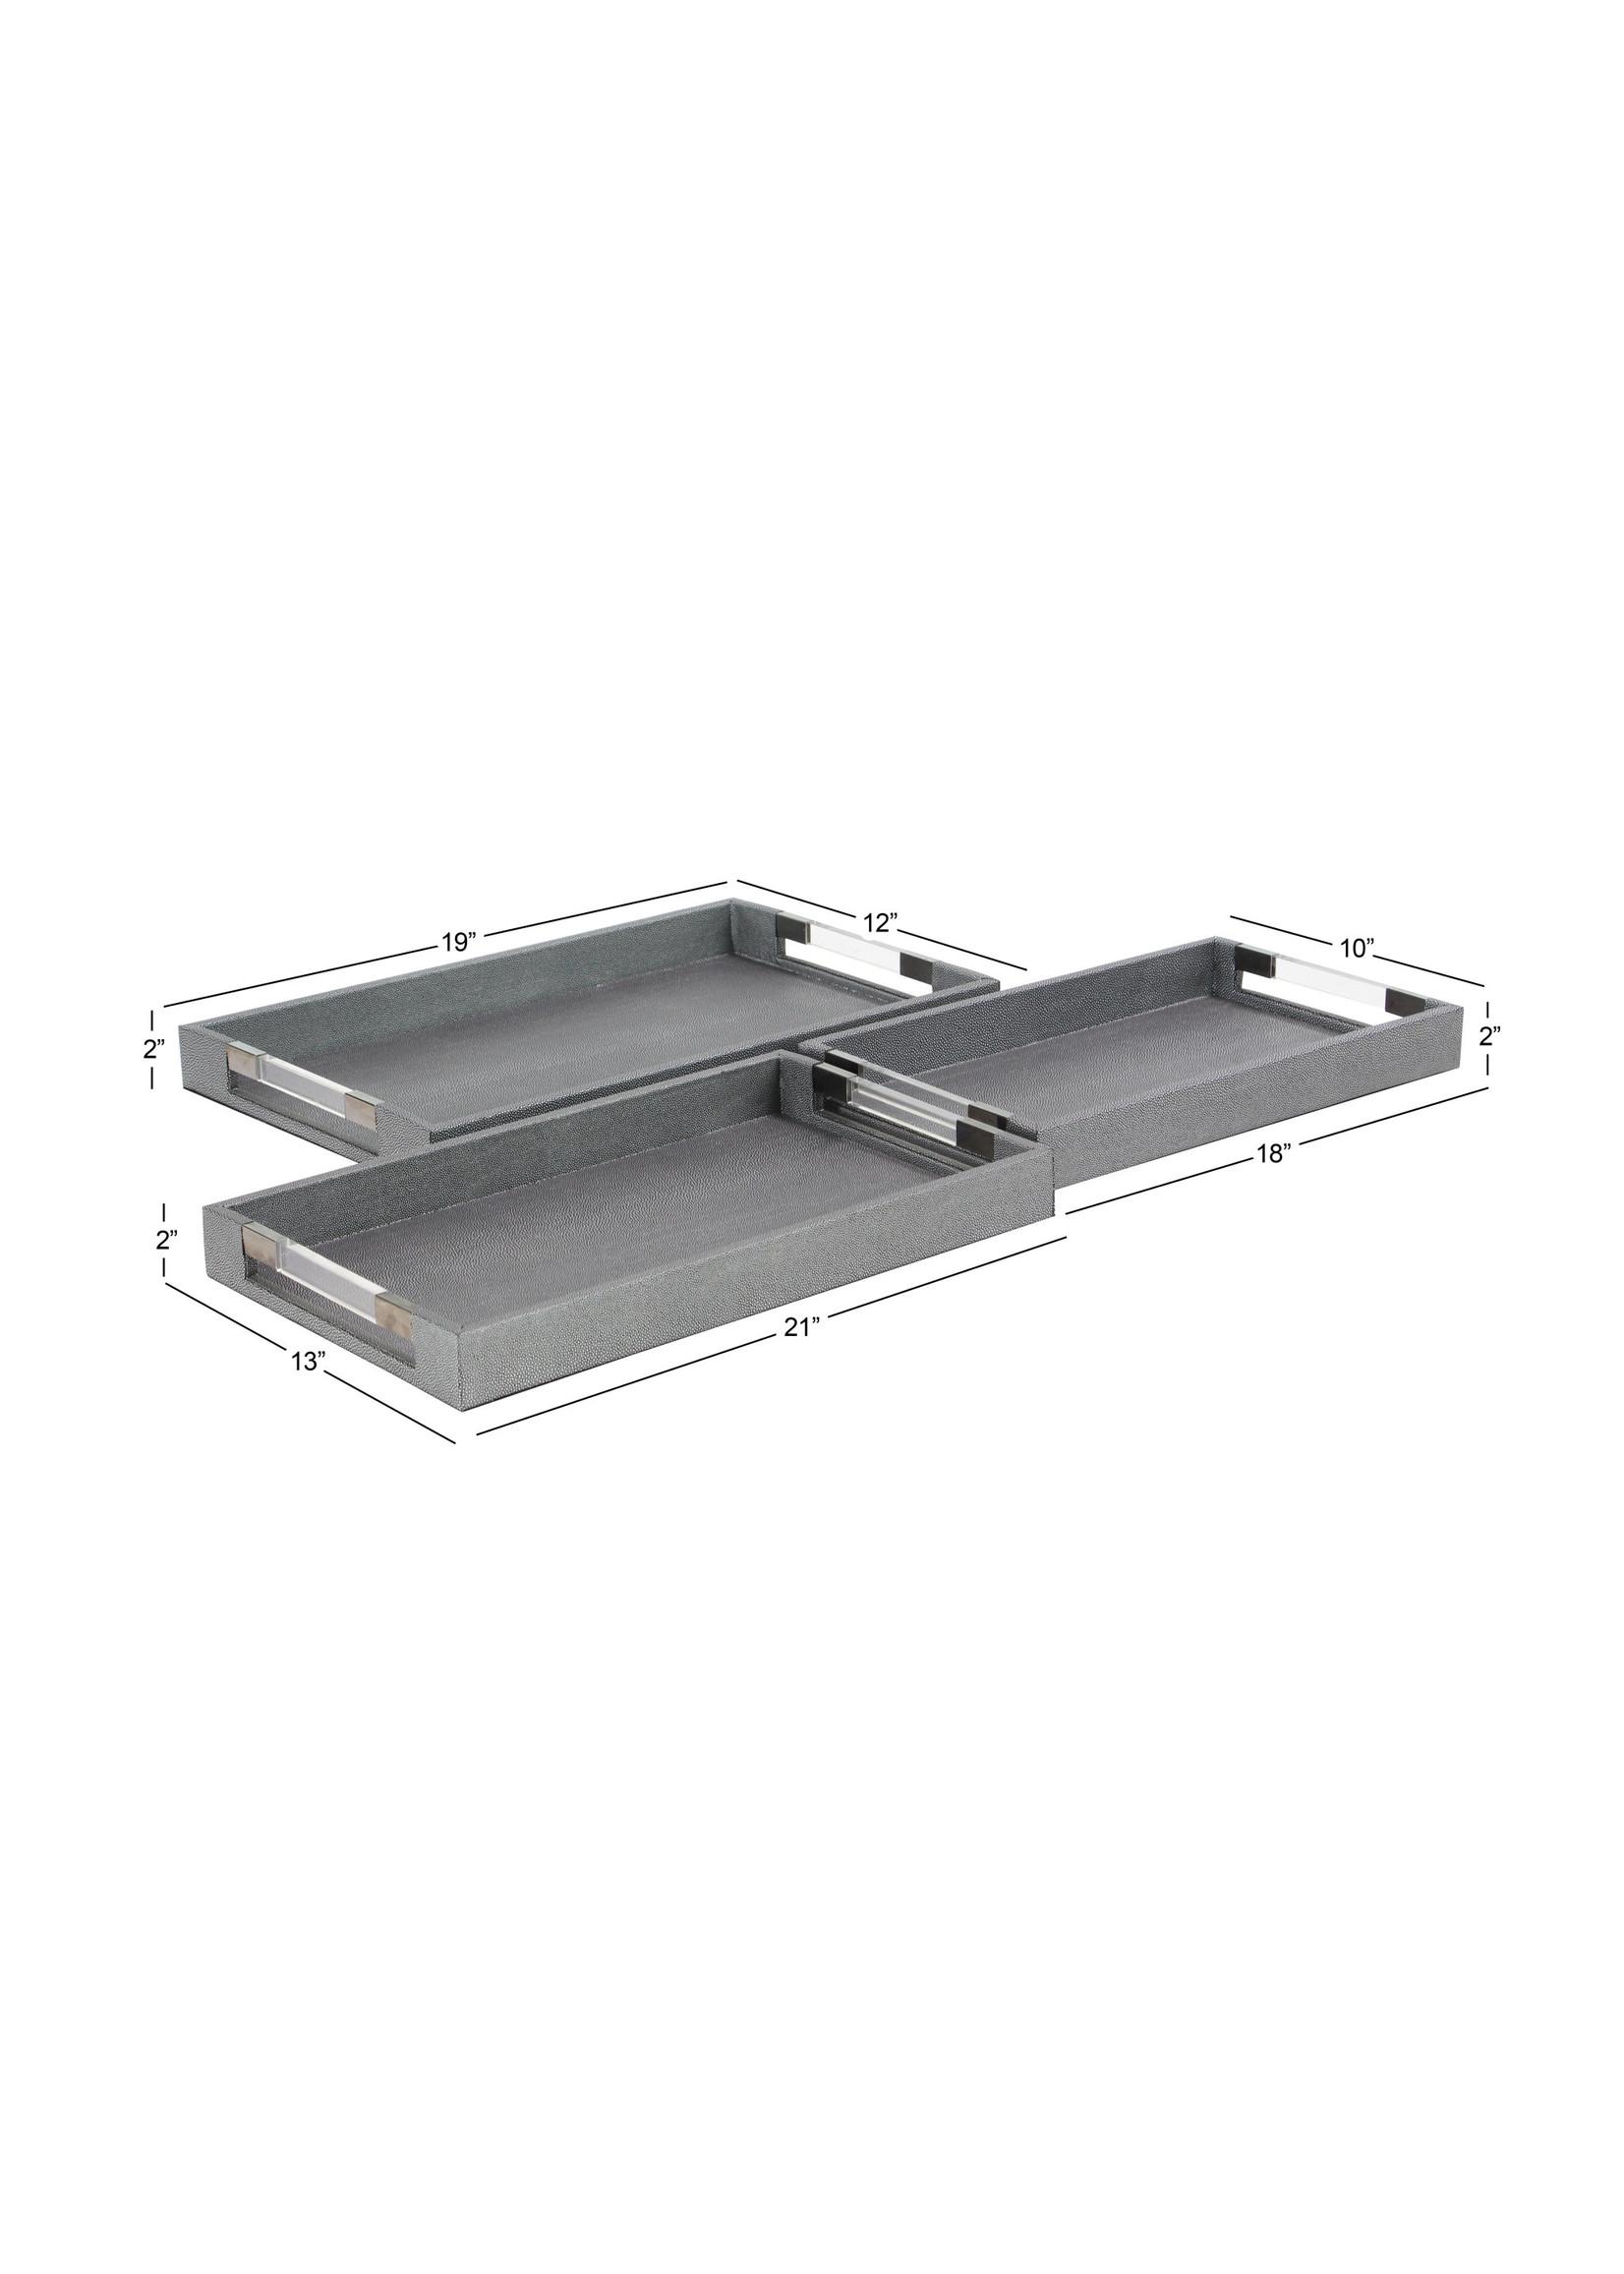 UMA Enterprises Wood Acrylic Tray - Small